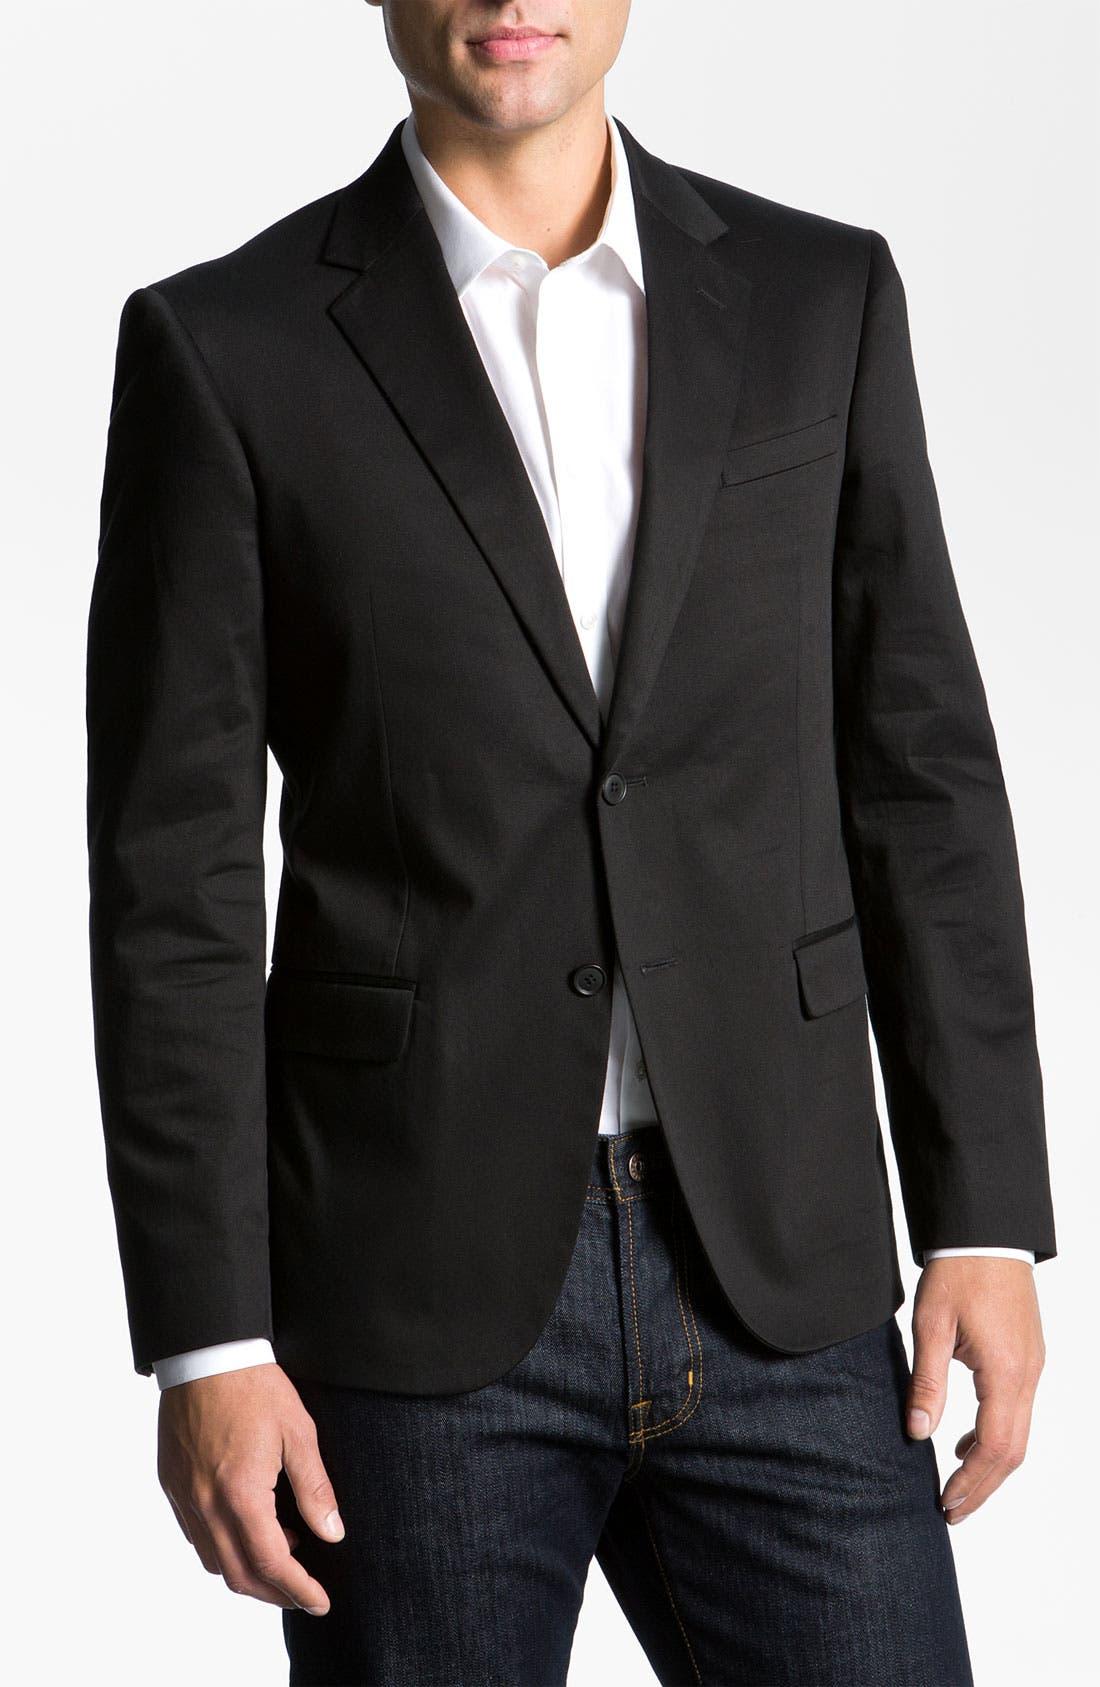 Main Image - Calibrate 'Core' Trim Fit Sportcoat